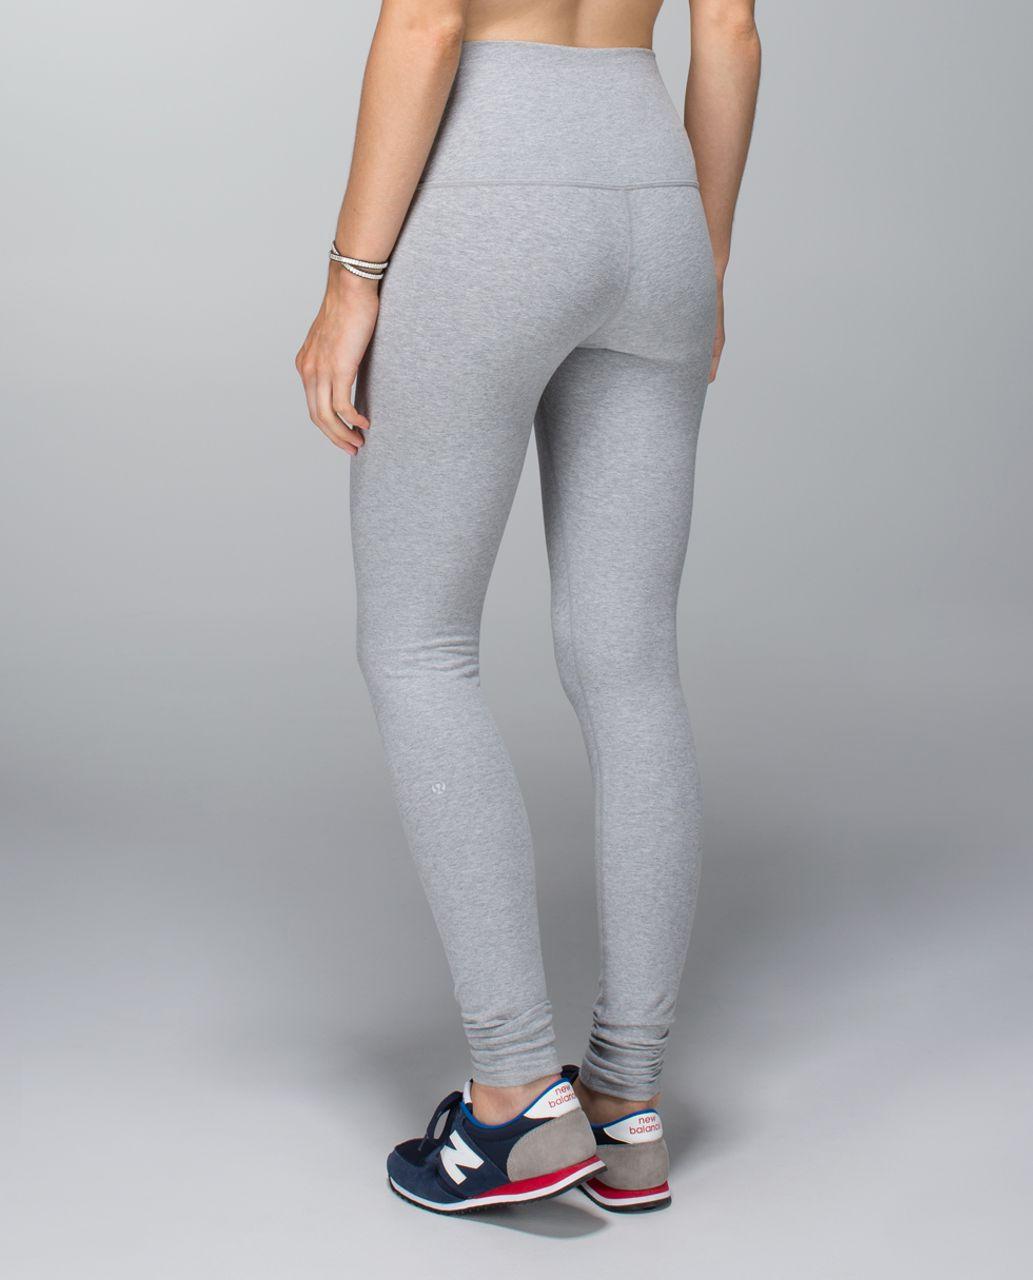 36e5c006201aa6 Lululemon Wunder Under Pant (Roll Down) *Cotton - Heathered Medium Grey -  lulu fanatics